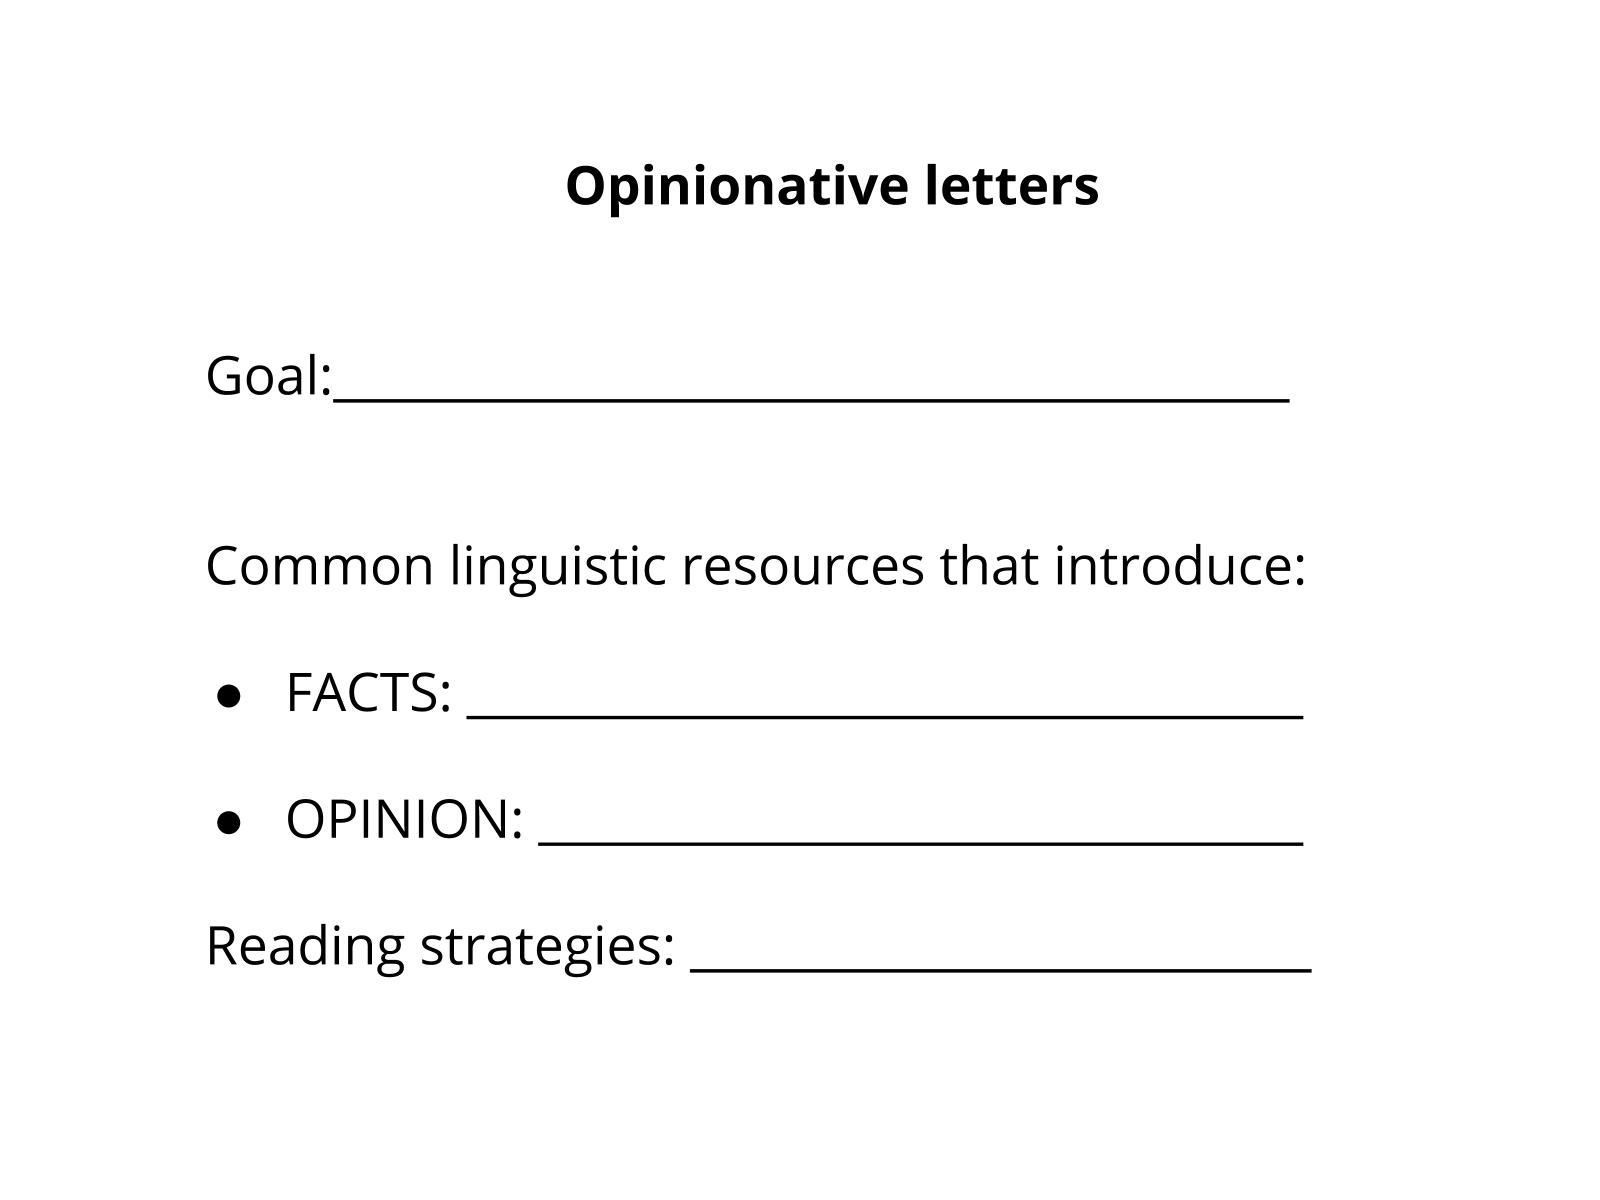 Carta opinativa